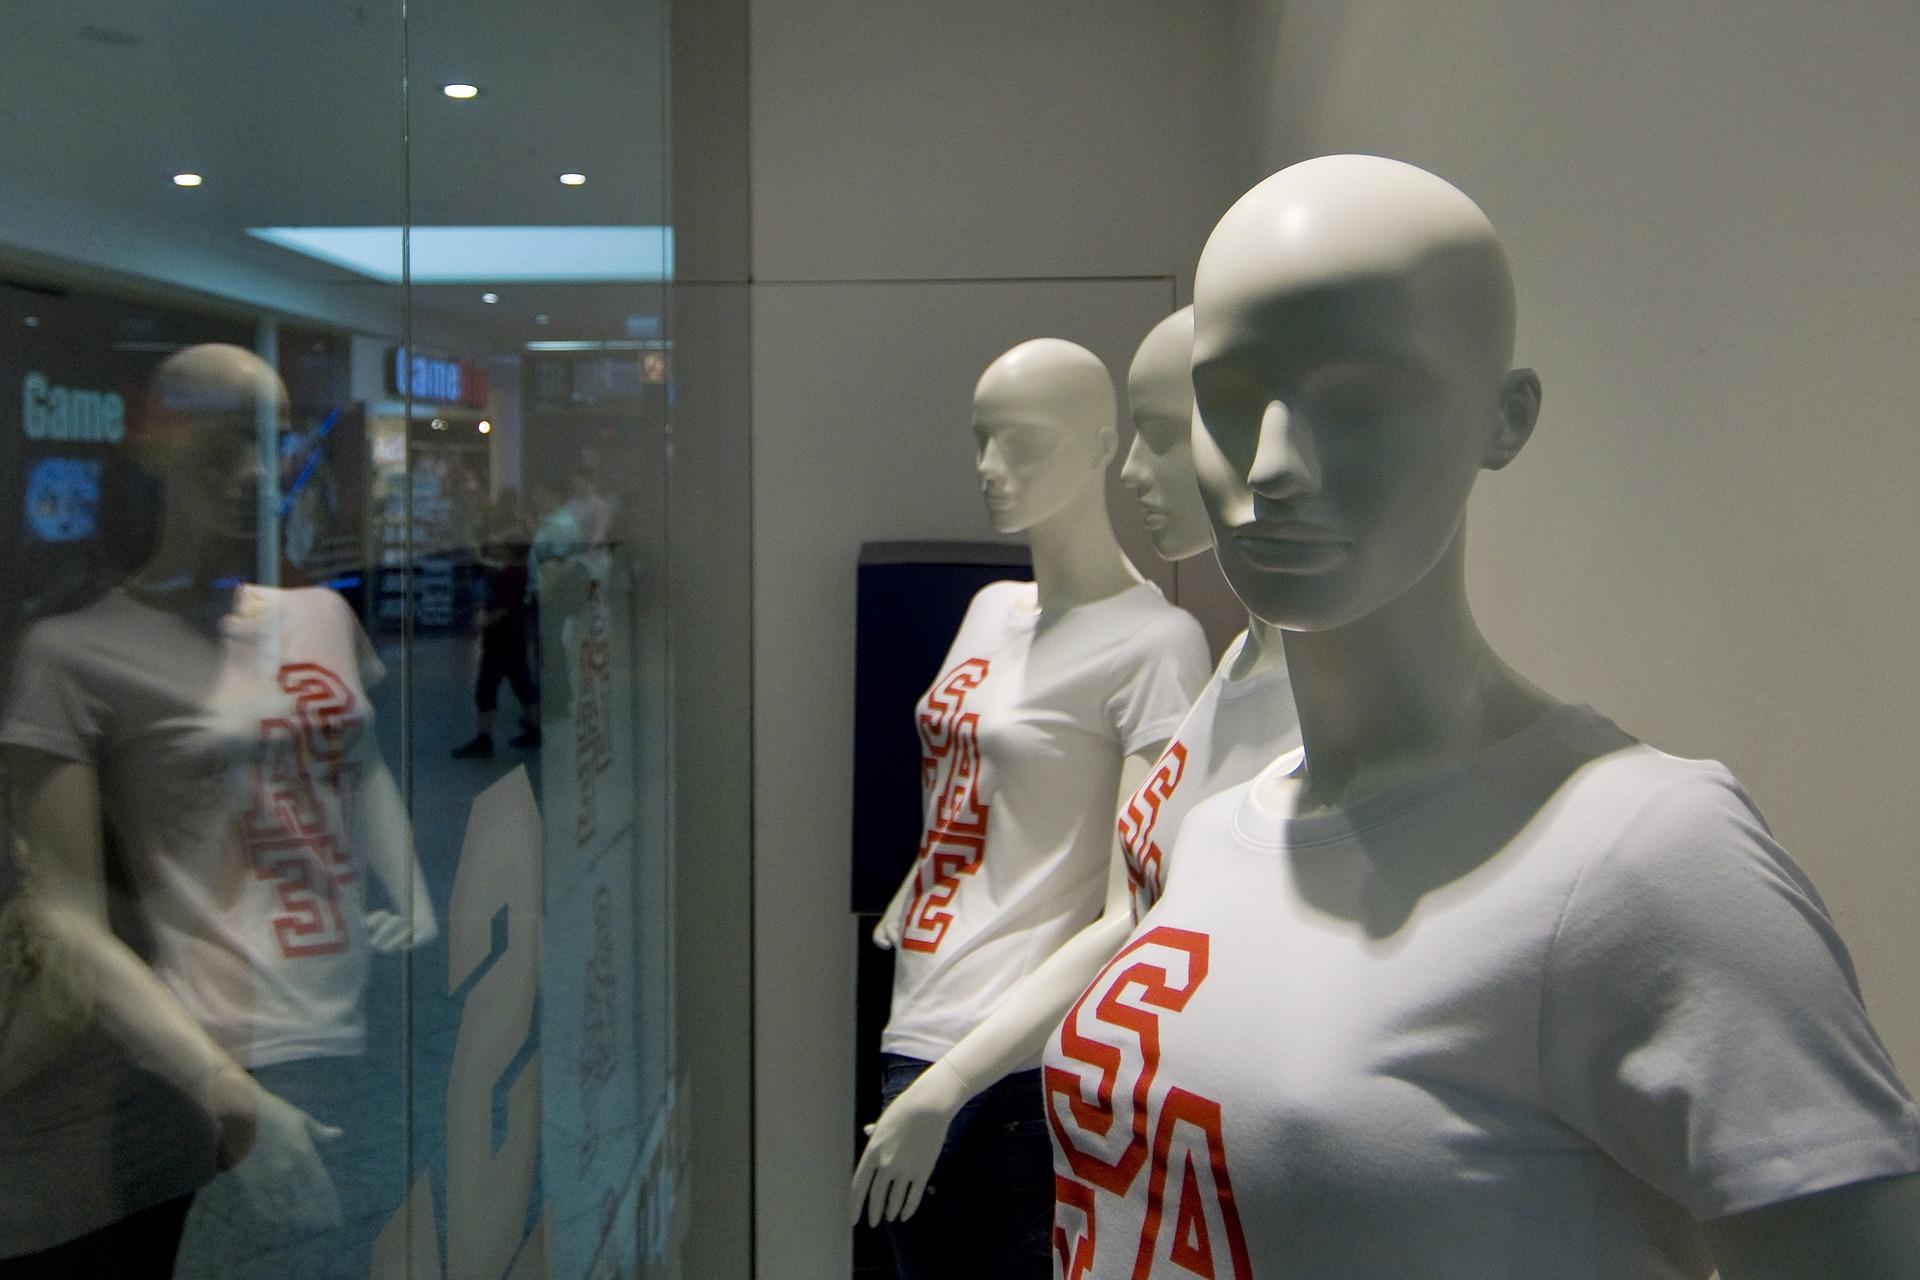 retail, man, window